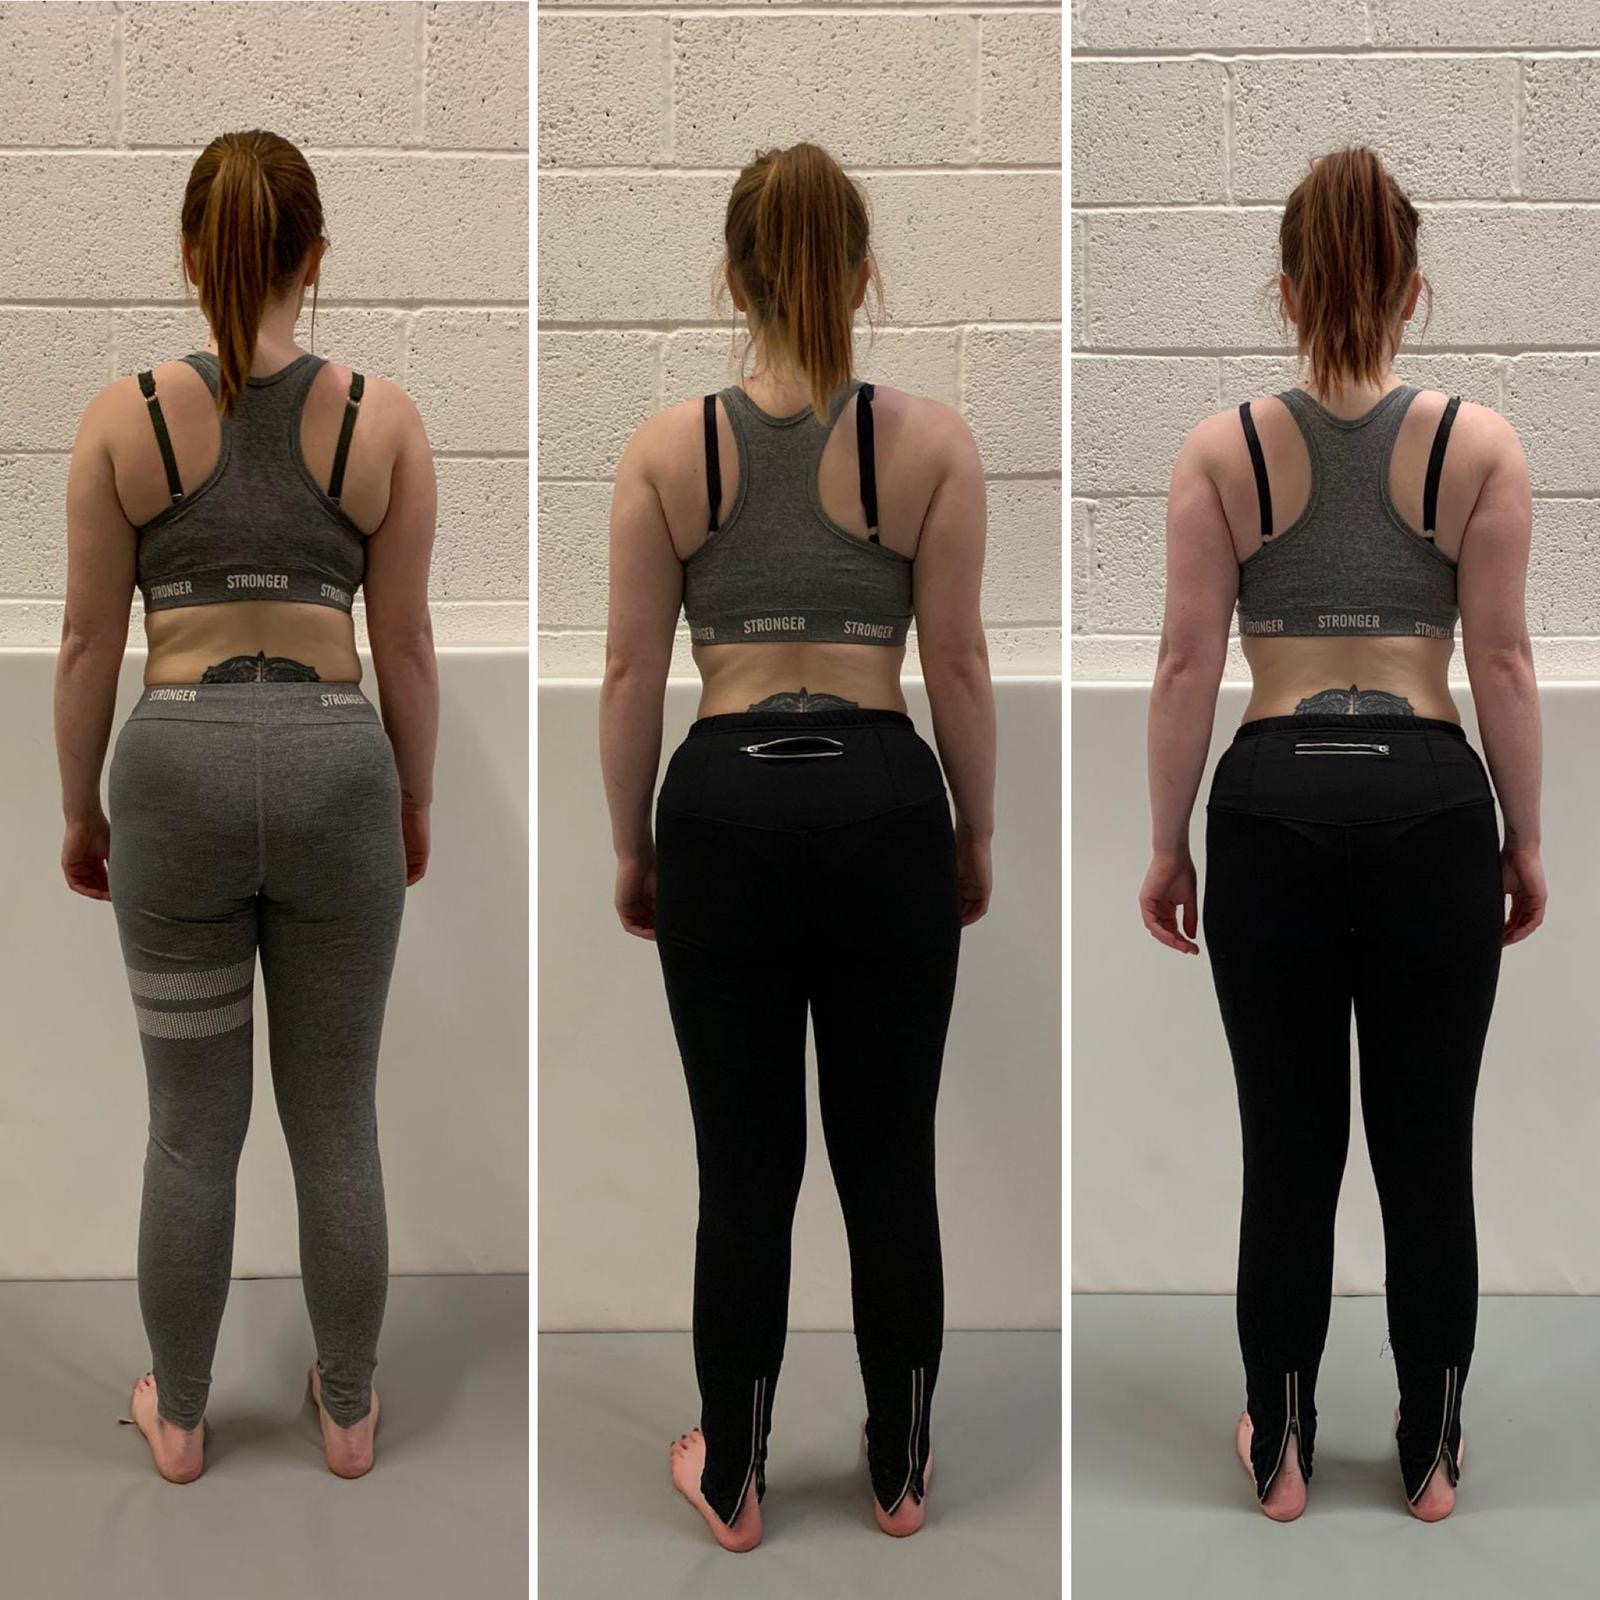 Sarah weight loss progress Primal Life Gym Lincoln 2